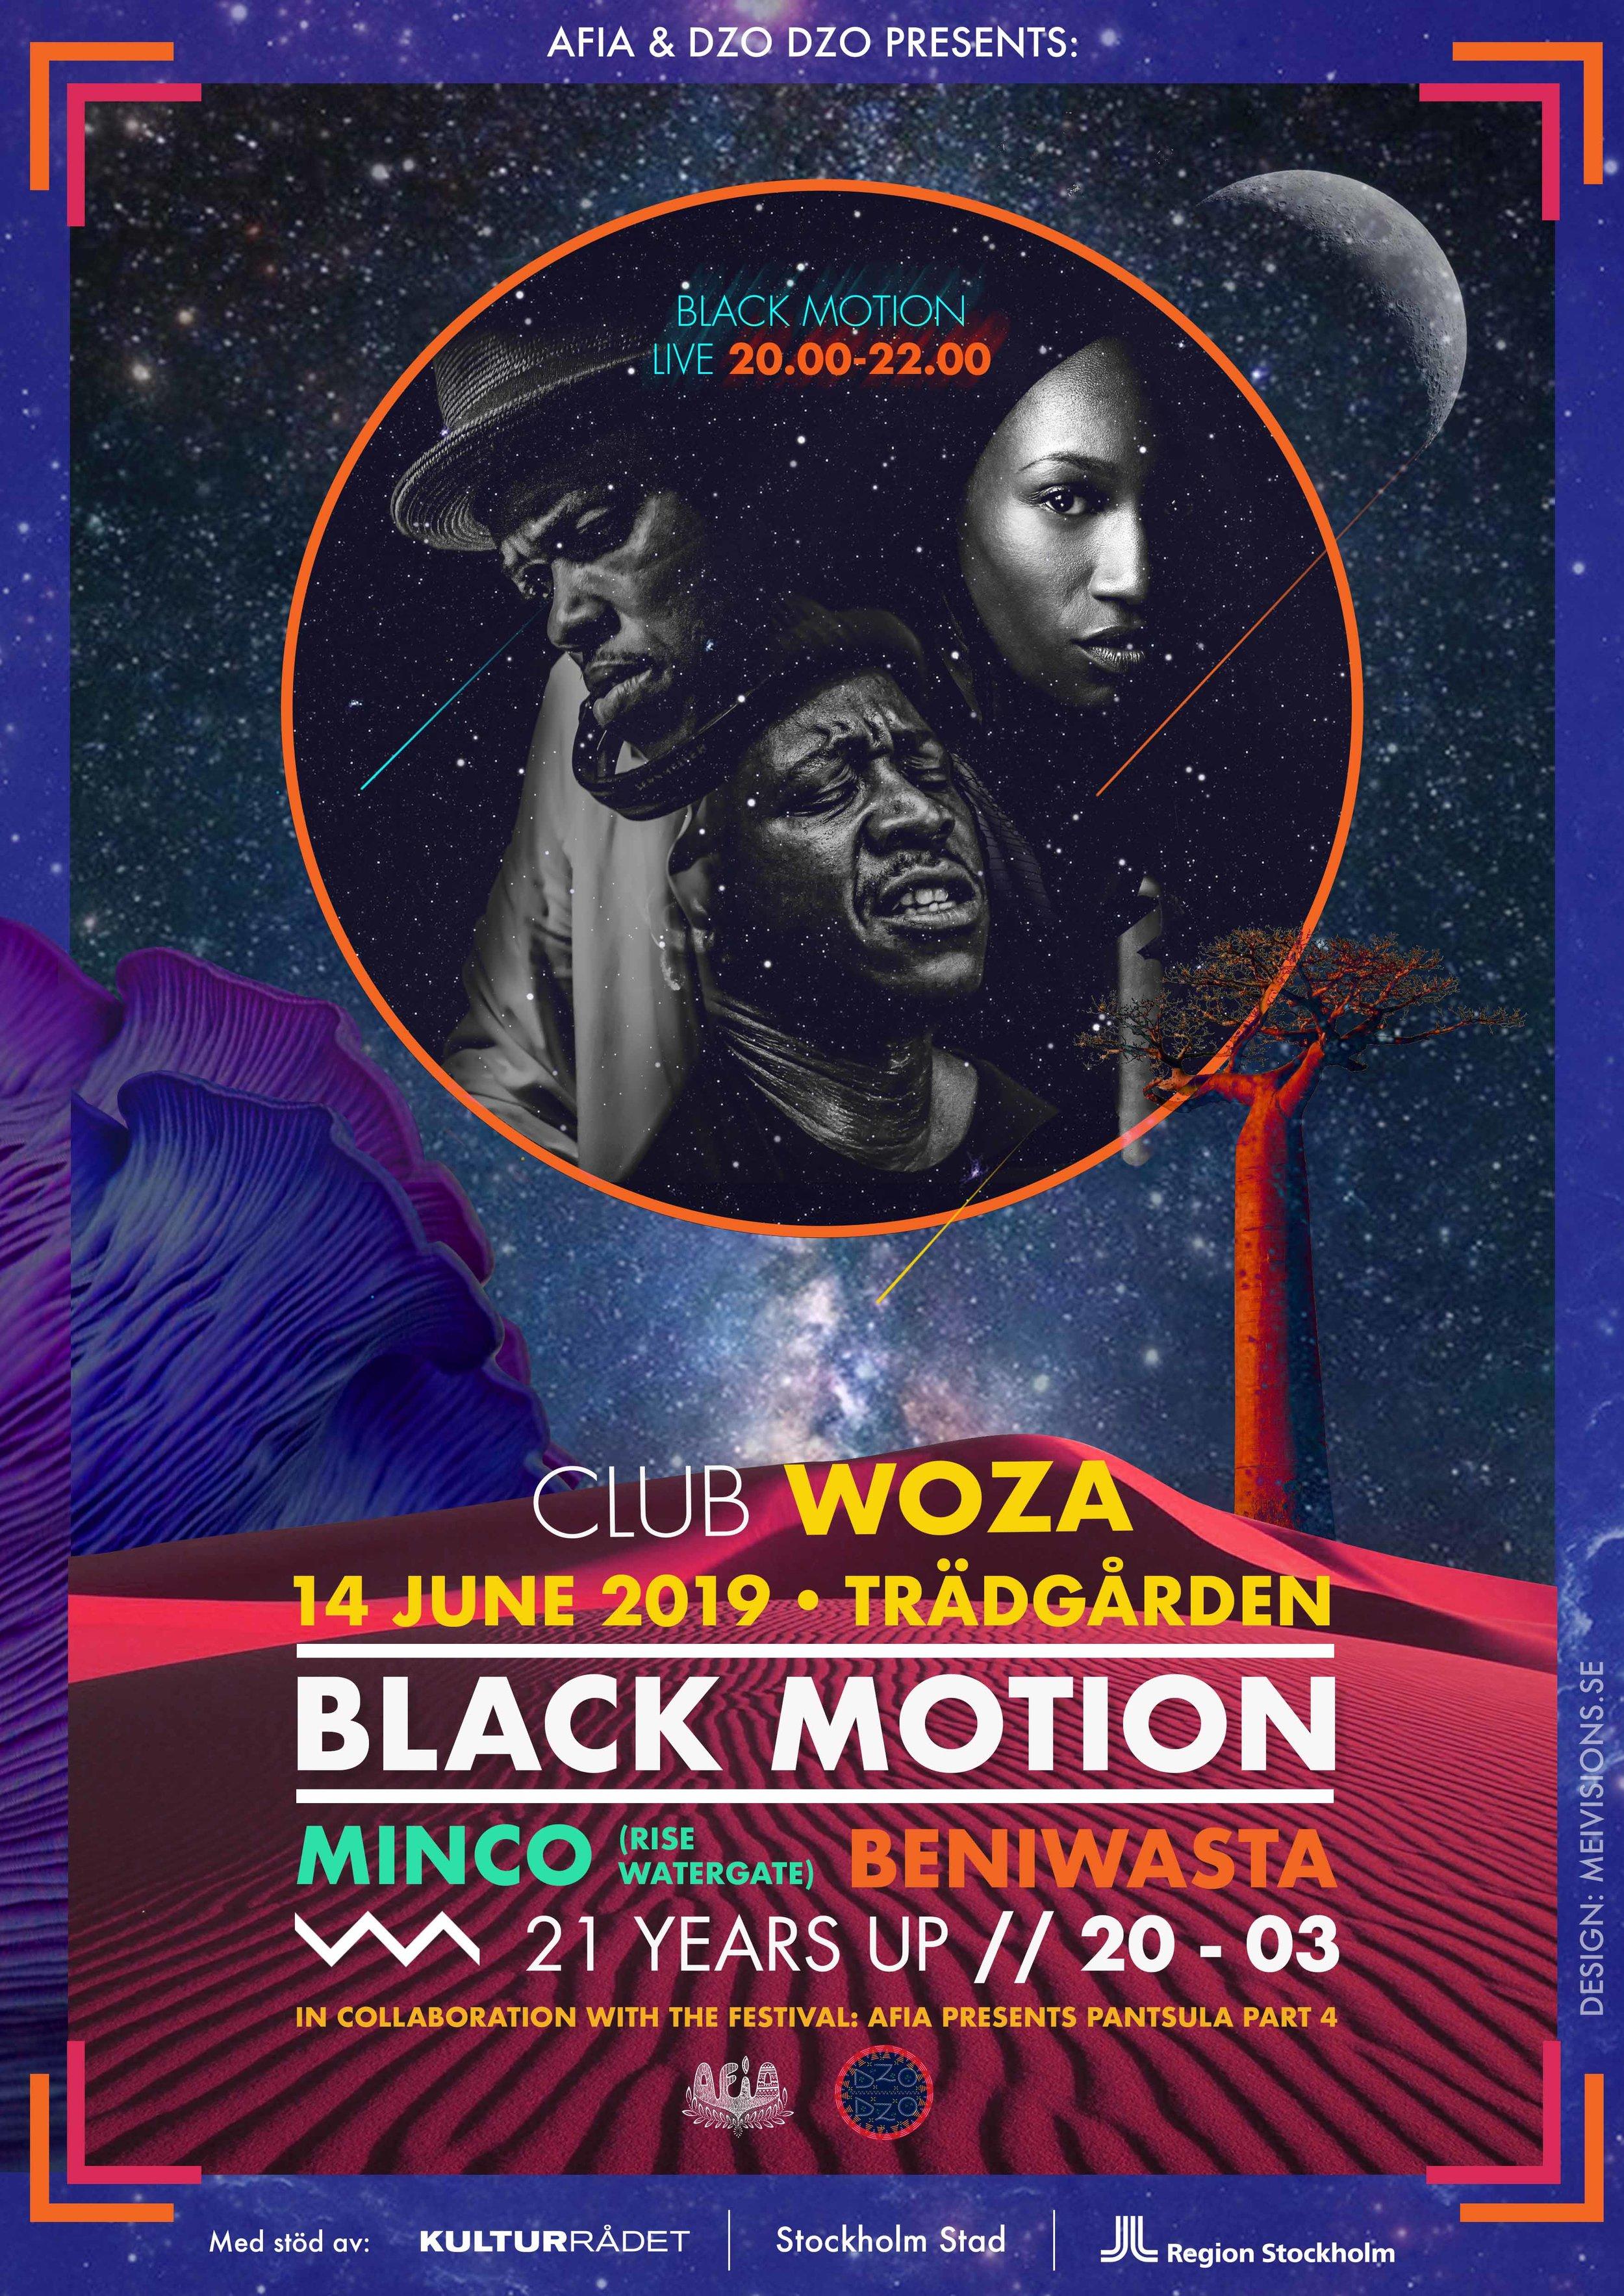 meivisions_afia_blackmotion_2019.jpg